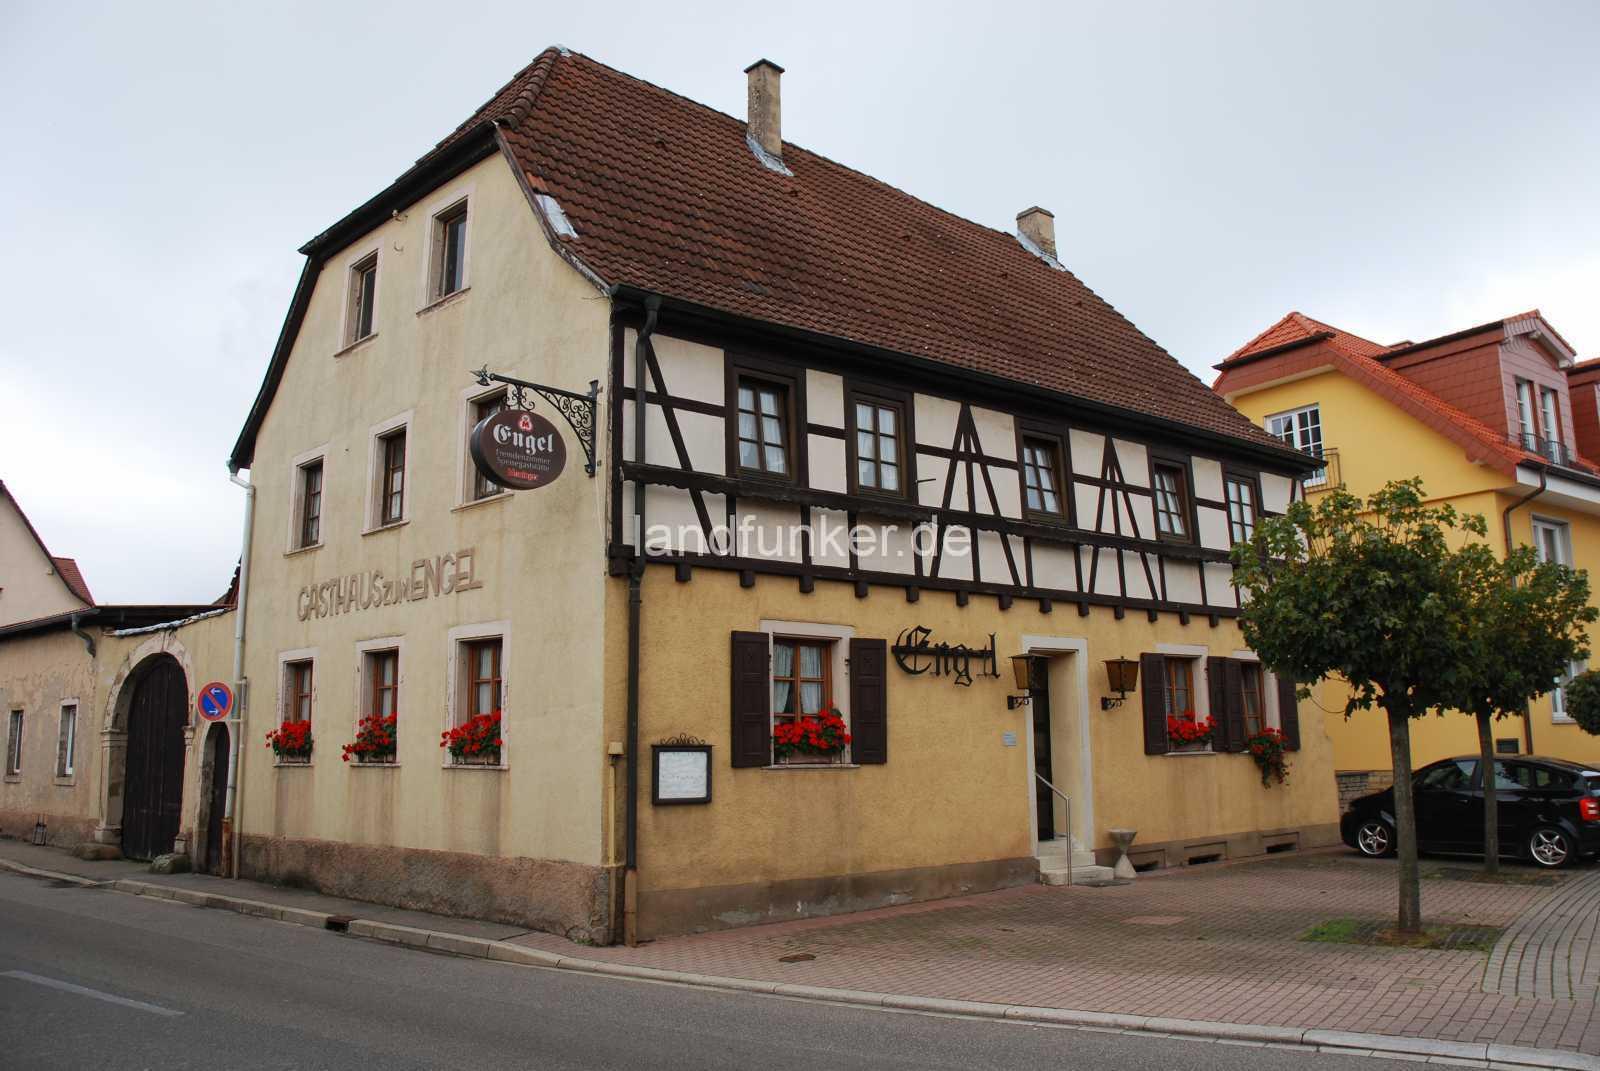 Corona Ubstadt Weiher